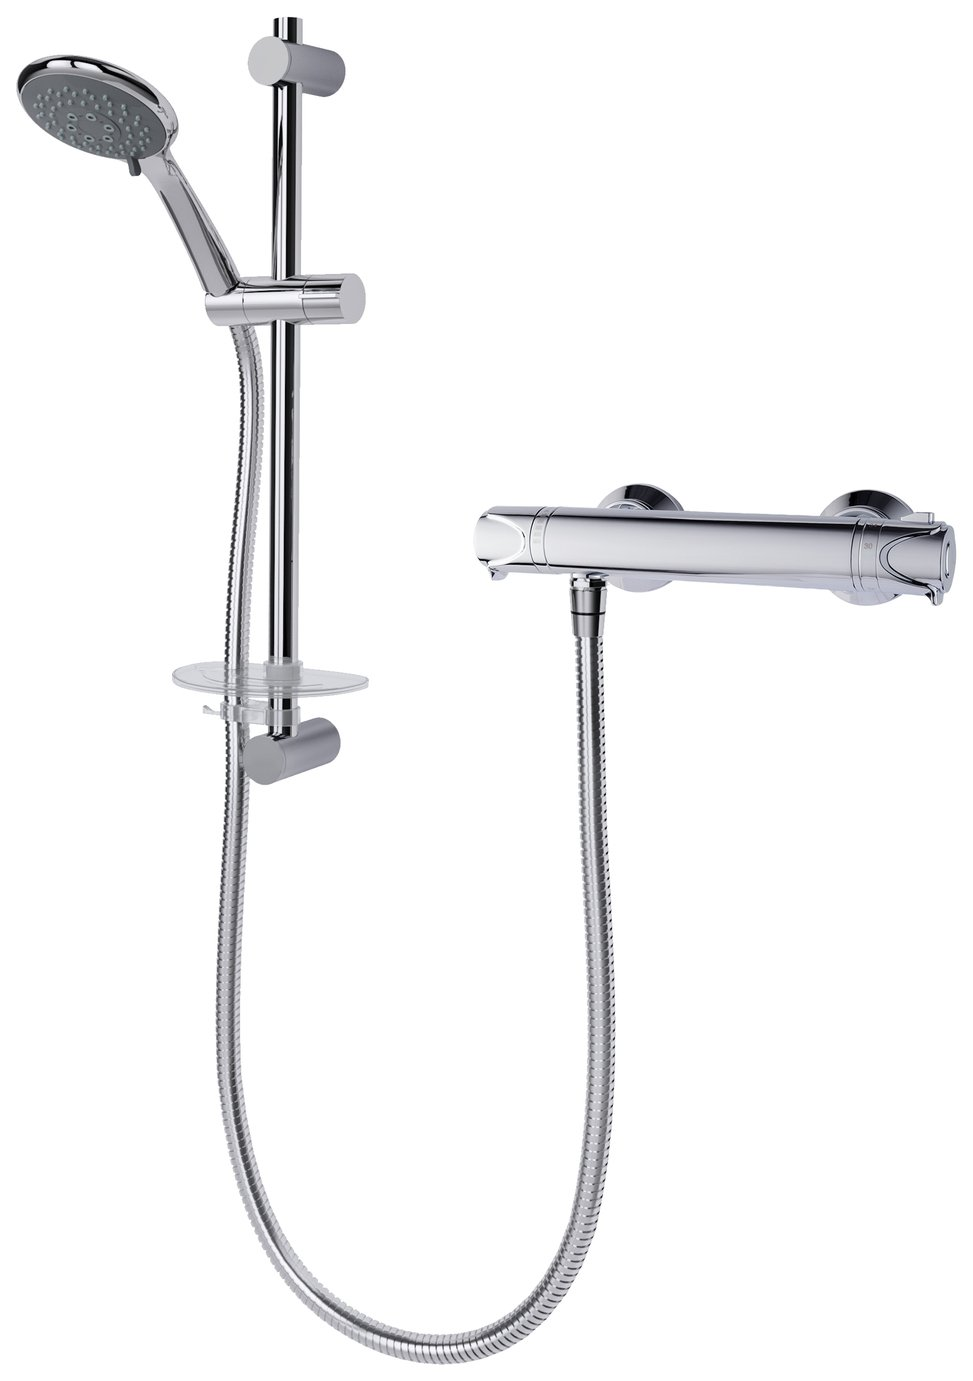 Triton Pirlo Hi Flow Bar Dual Control Mixer Shower - Chrome